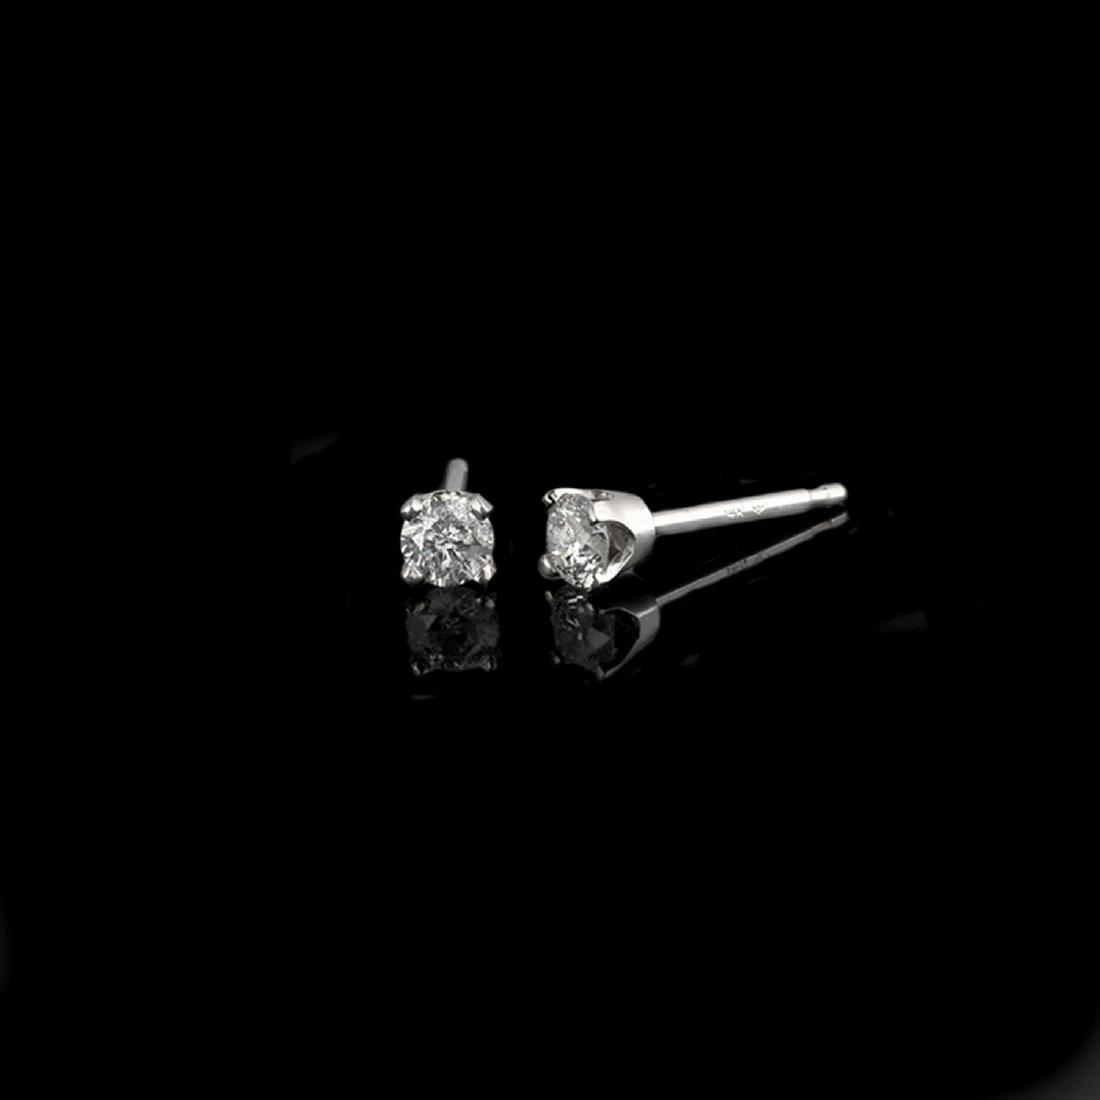 *Fine Jewelry 14 kt. White Gold, Custom Made 0.25CT